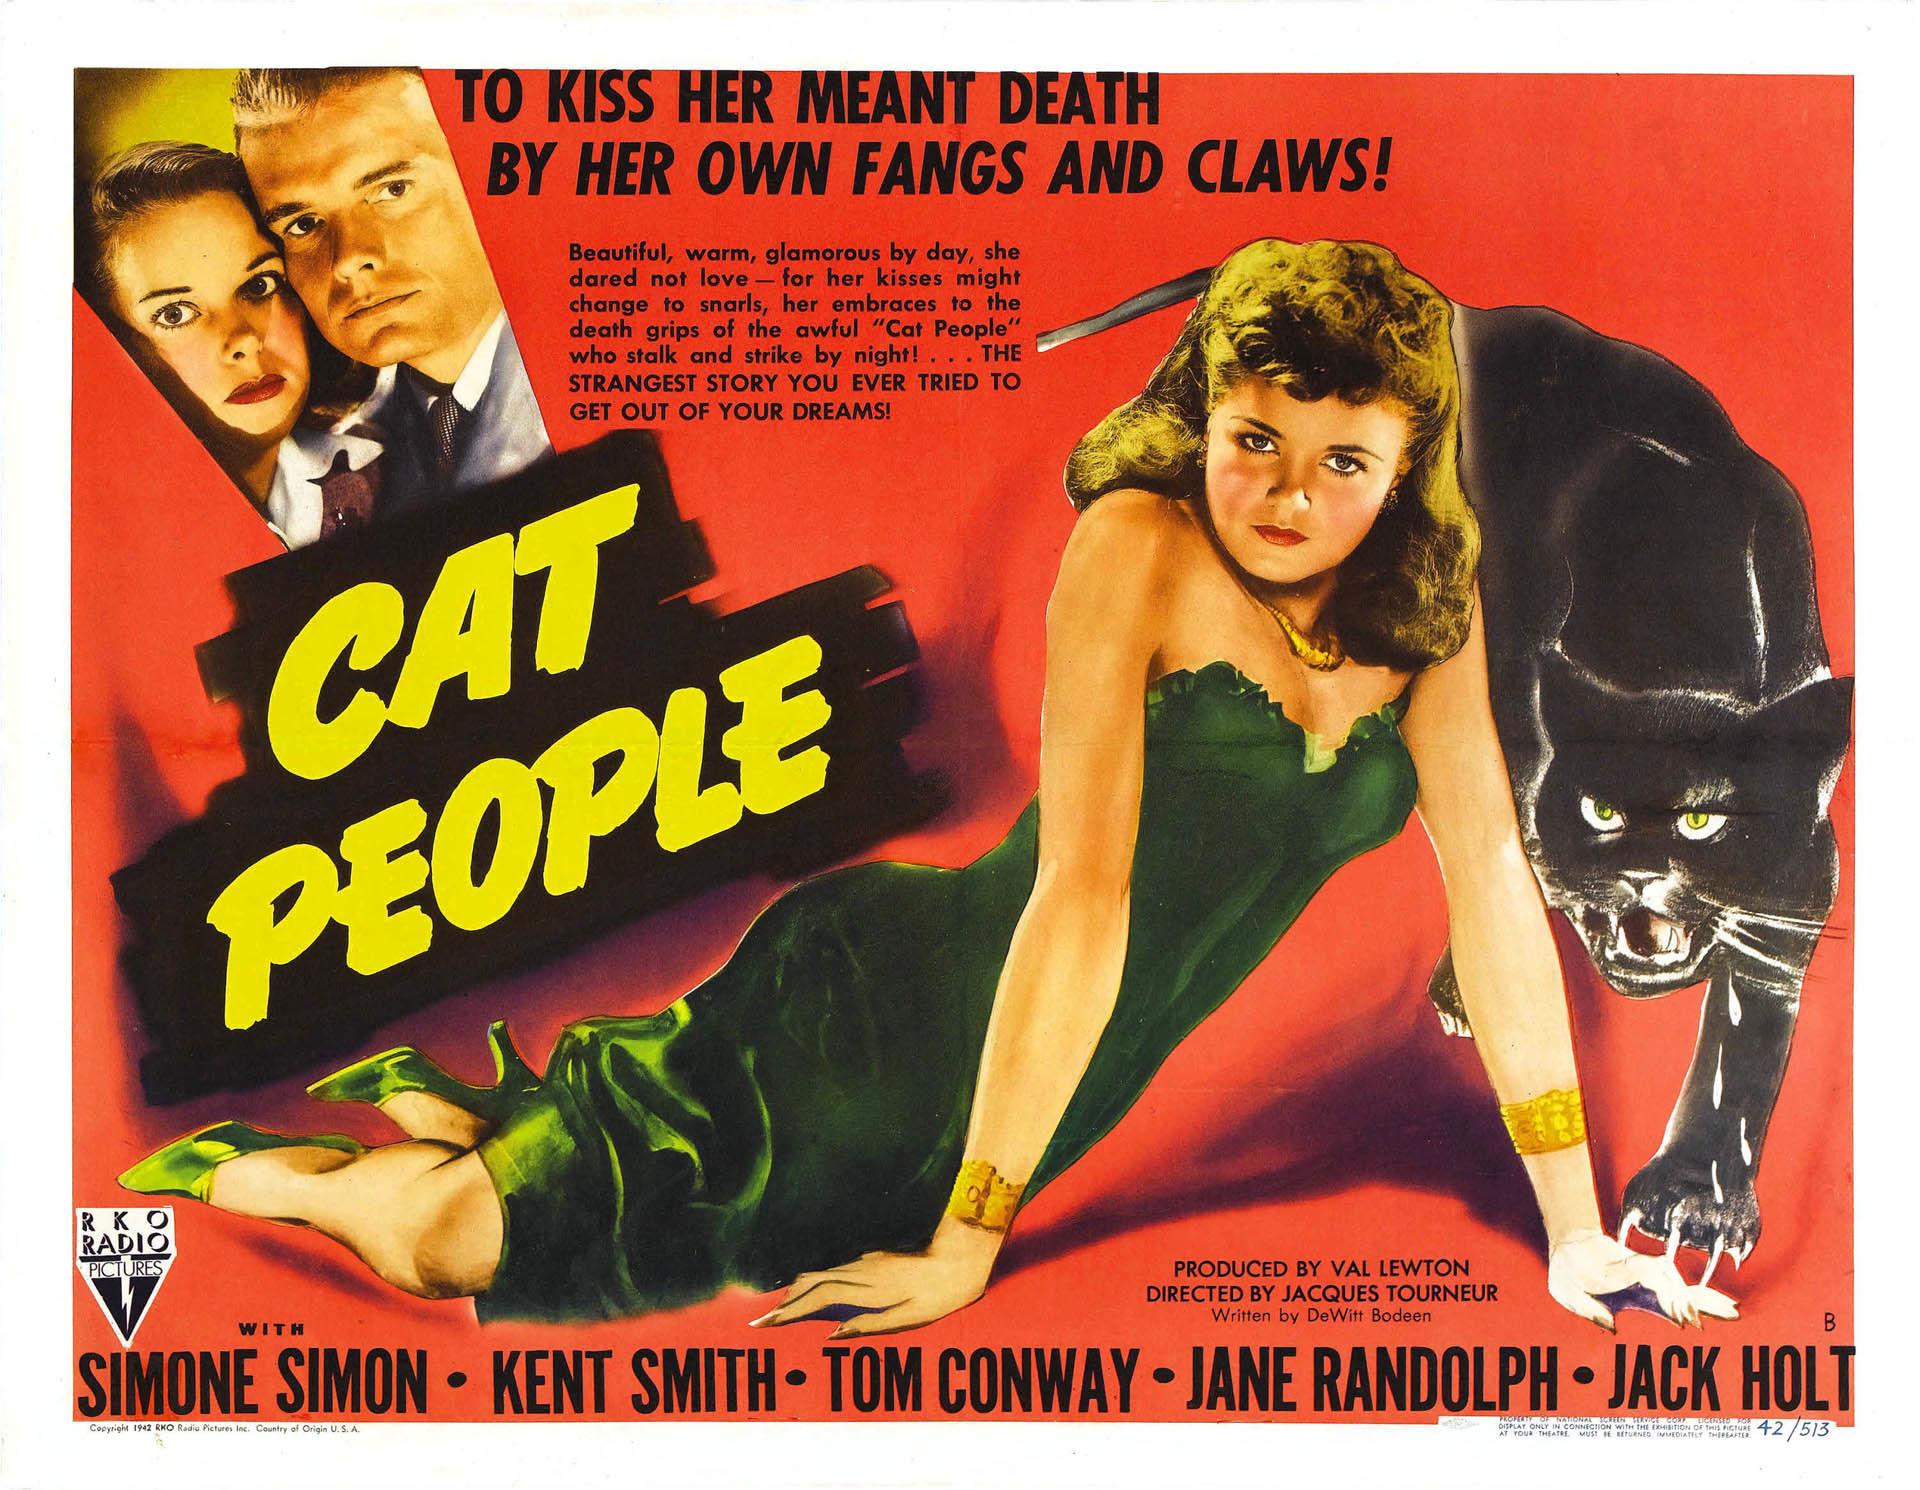 1940 Movie Posters | Cat People Ii – Vintage 1940s Movie Posters Wallpaper  Image